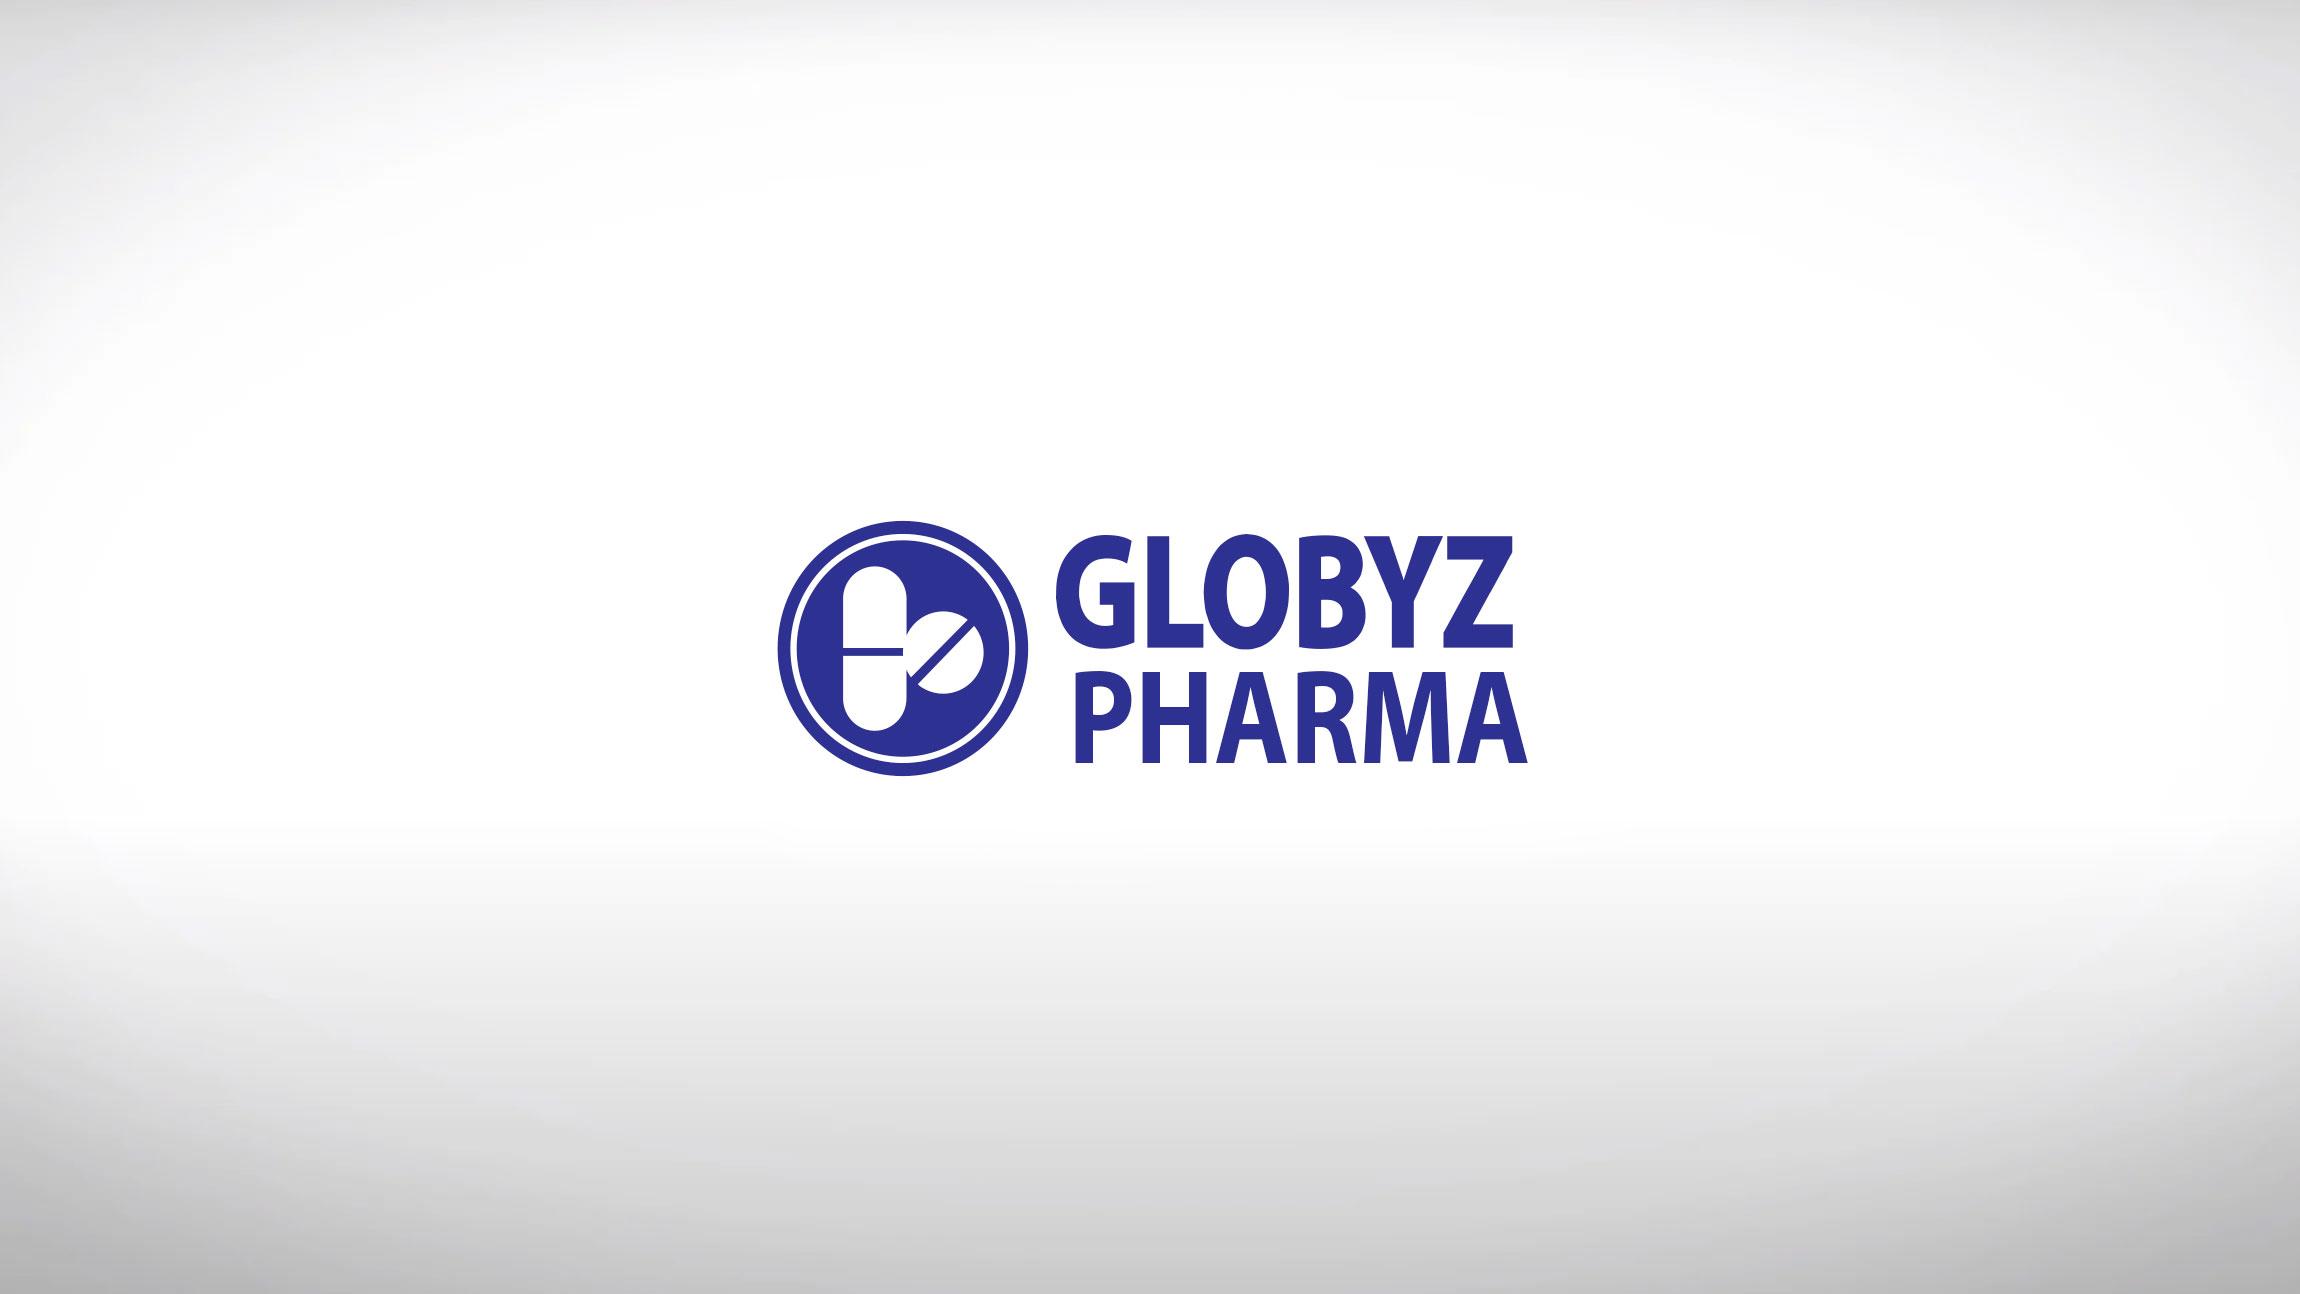 globyz-bg